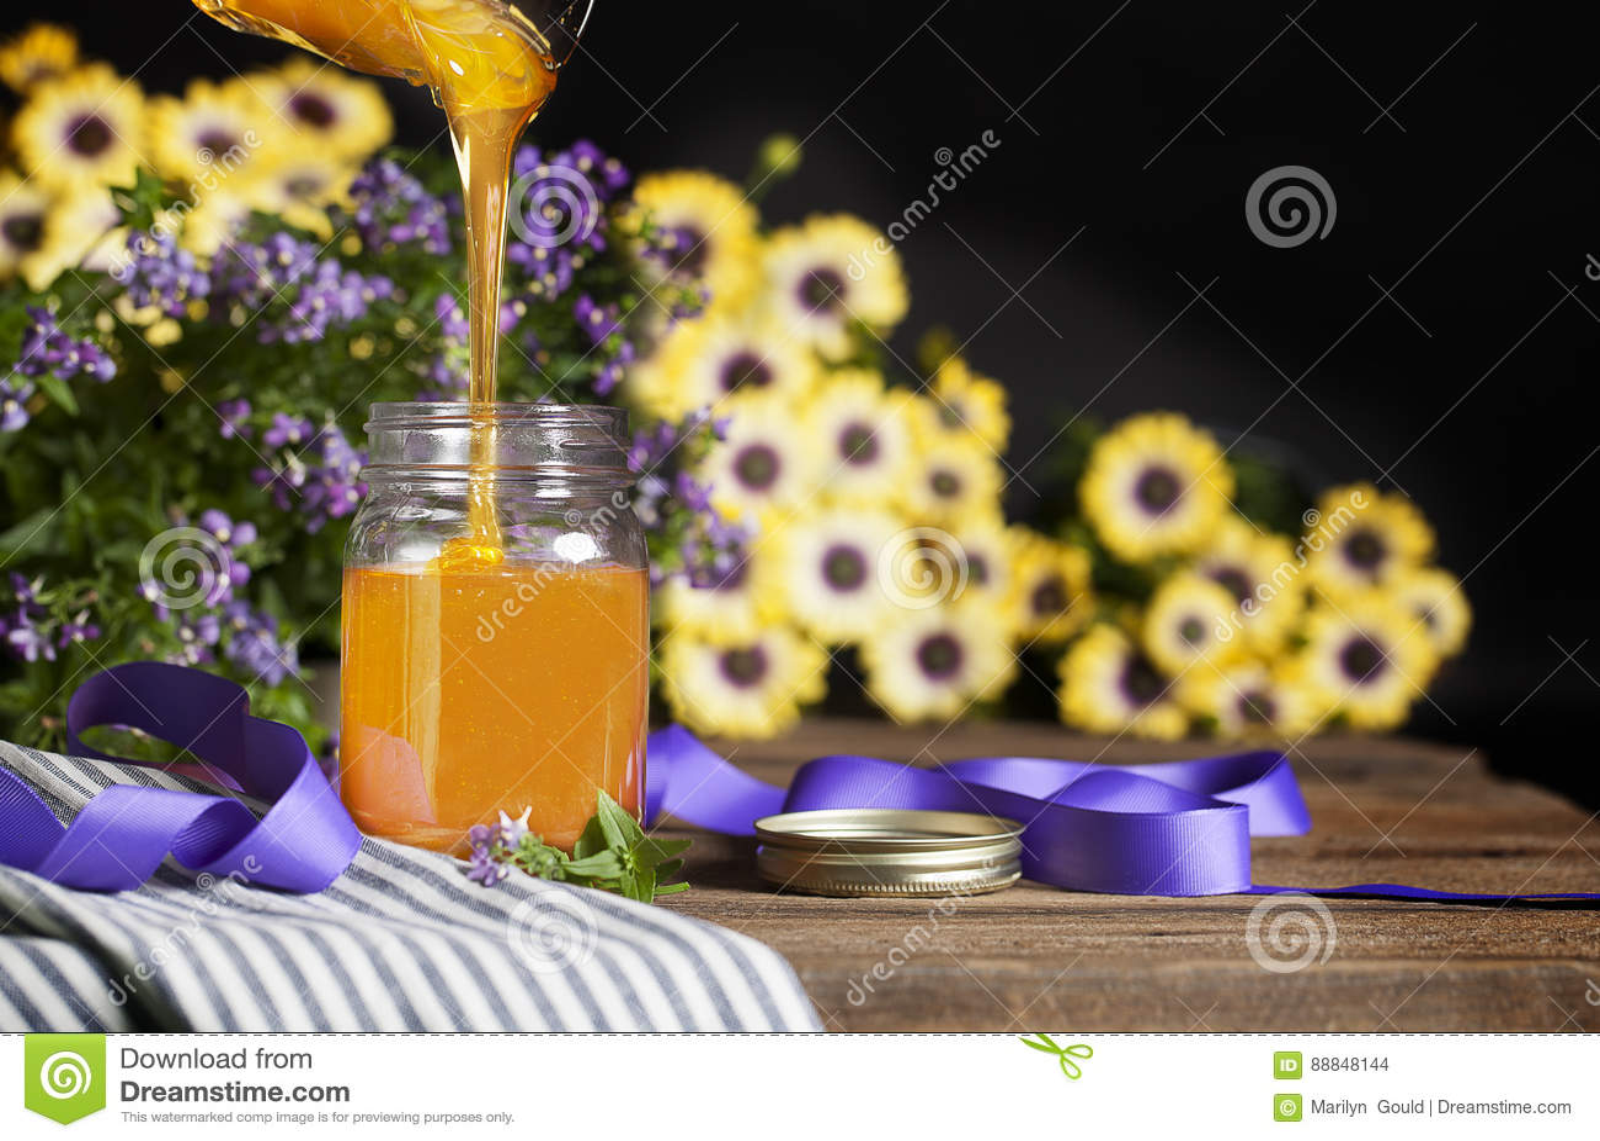 Honey Filling Glass Jar